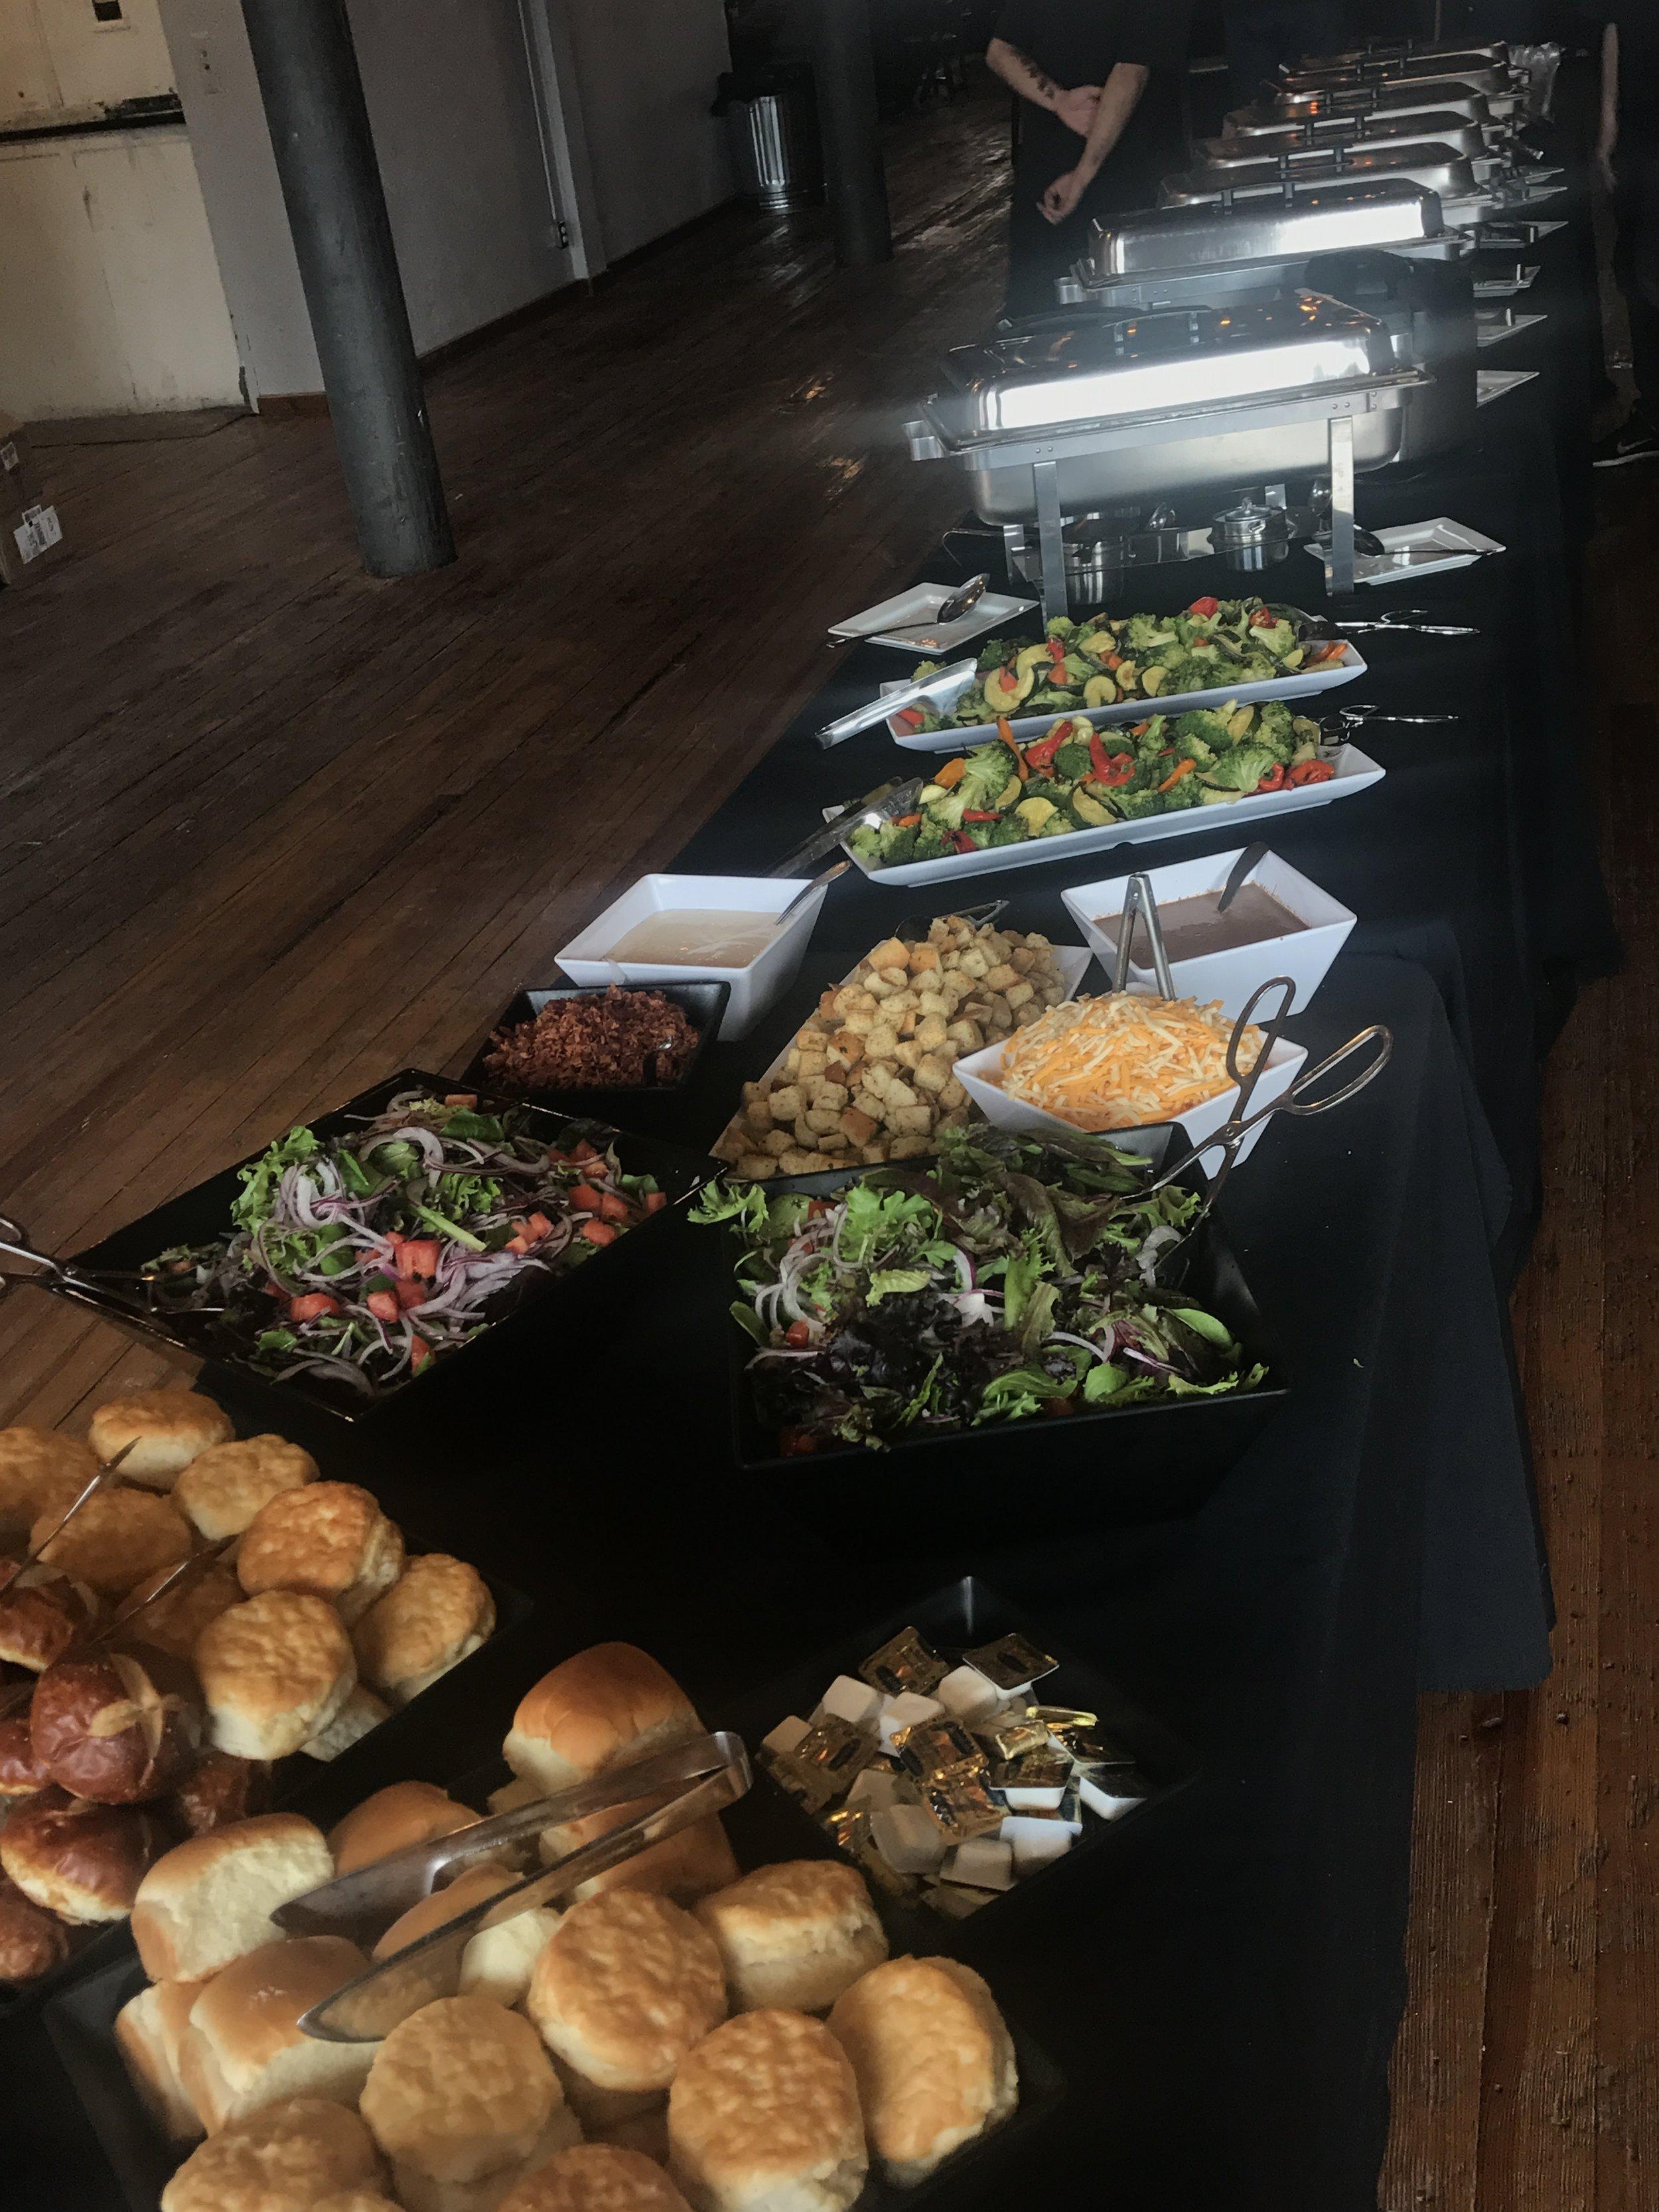 box-lunches-breakfast-buffett-appetizers-full-buffett-office-catering-lenexa-mission-hills-plaza-kcmo-organic110.jpg